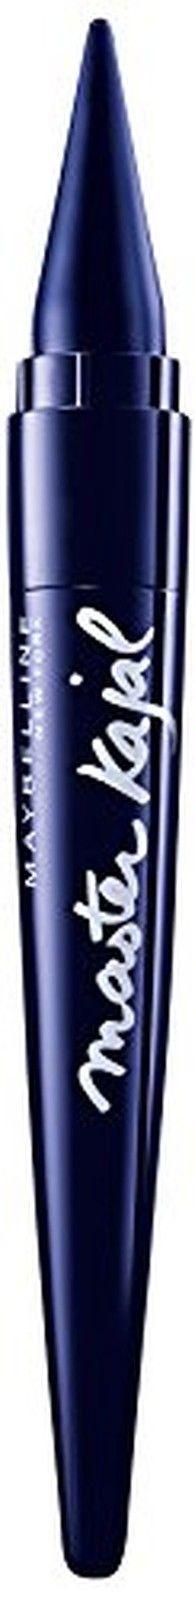 Maybelline Master Kajal Kohl Liner - Lapis Blue